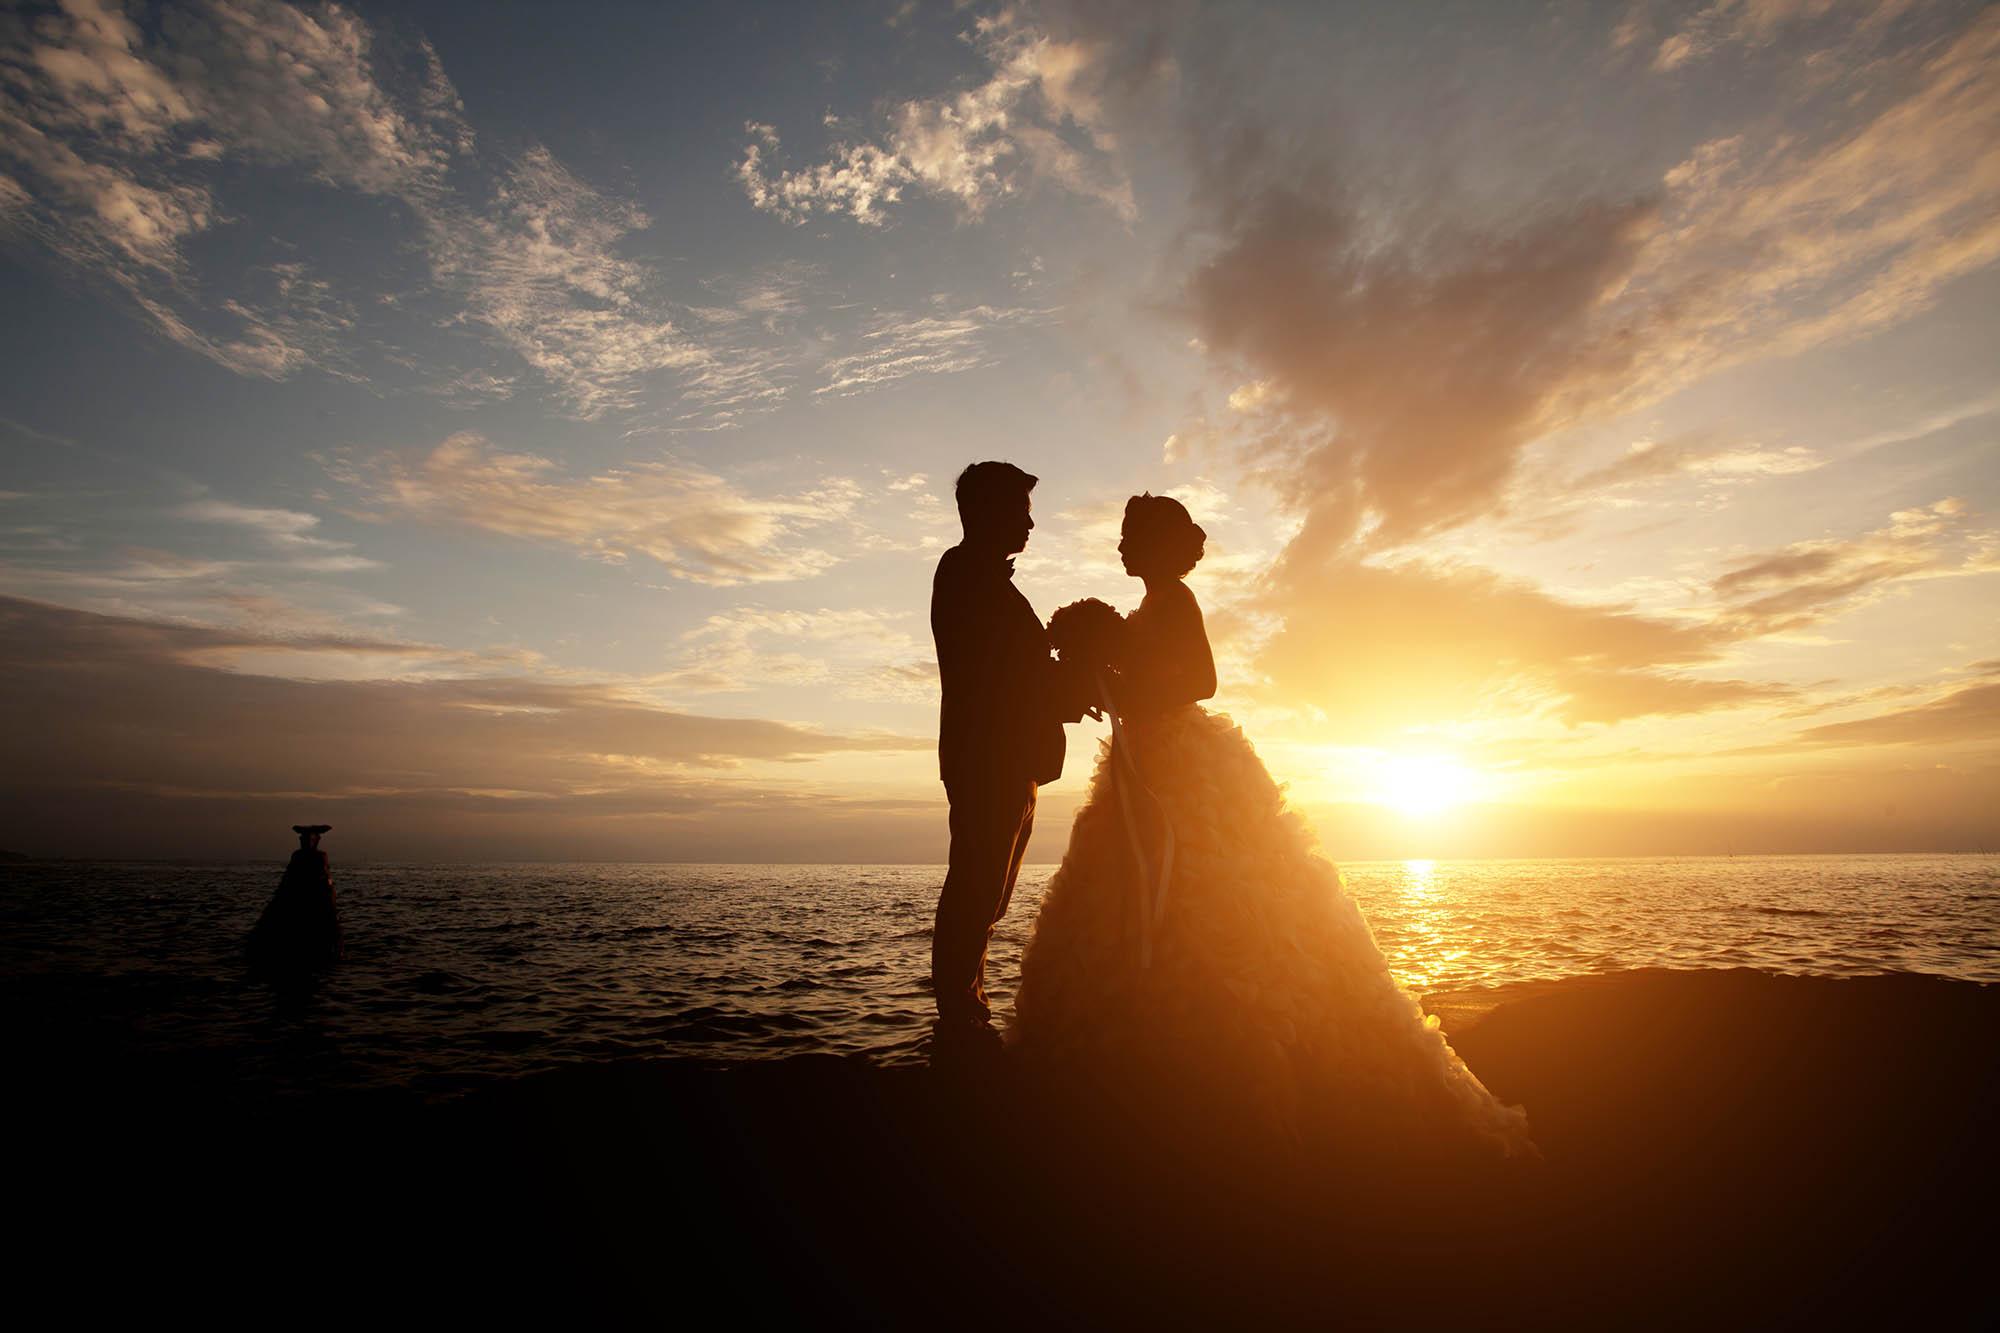 beautiful sunset on the sea